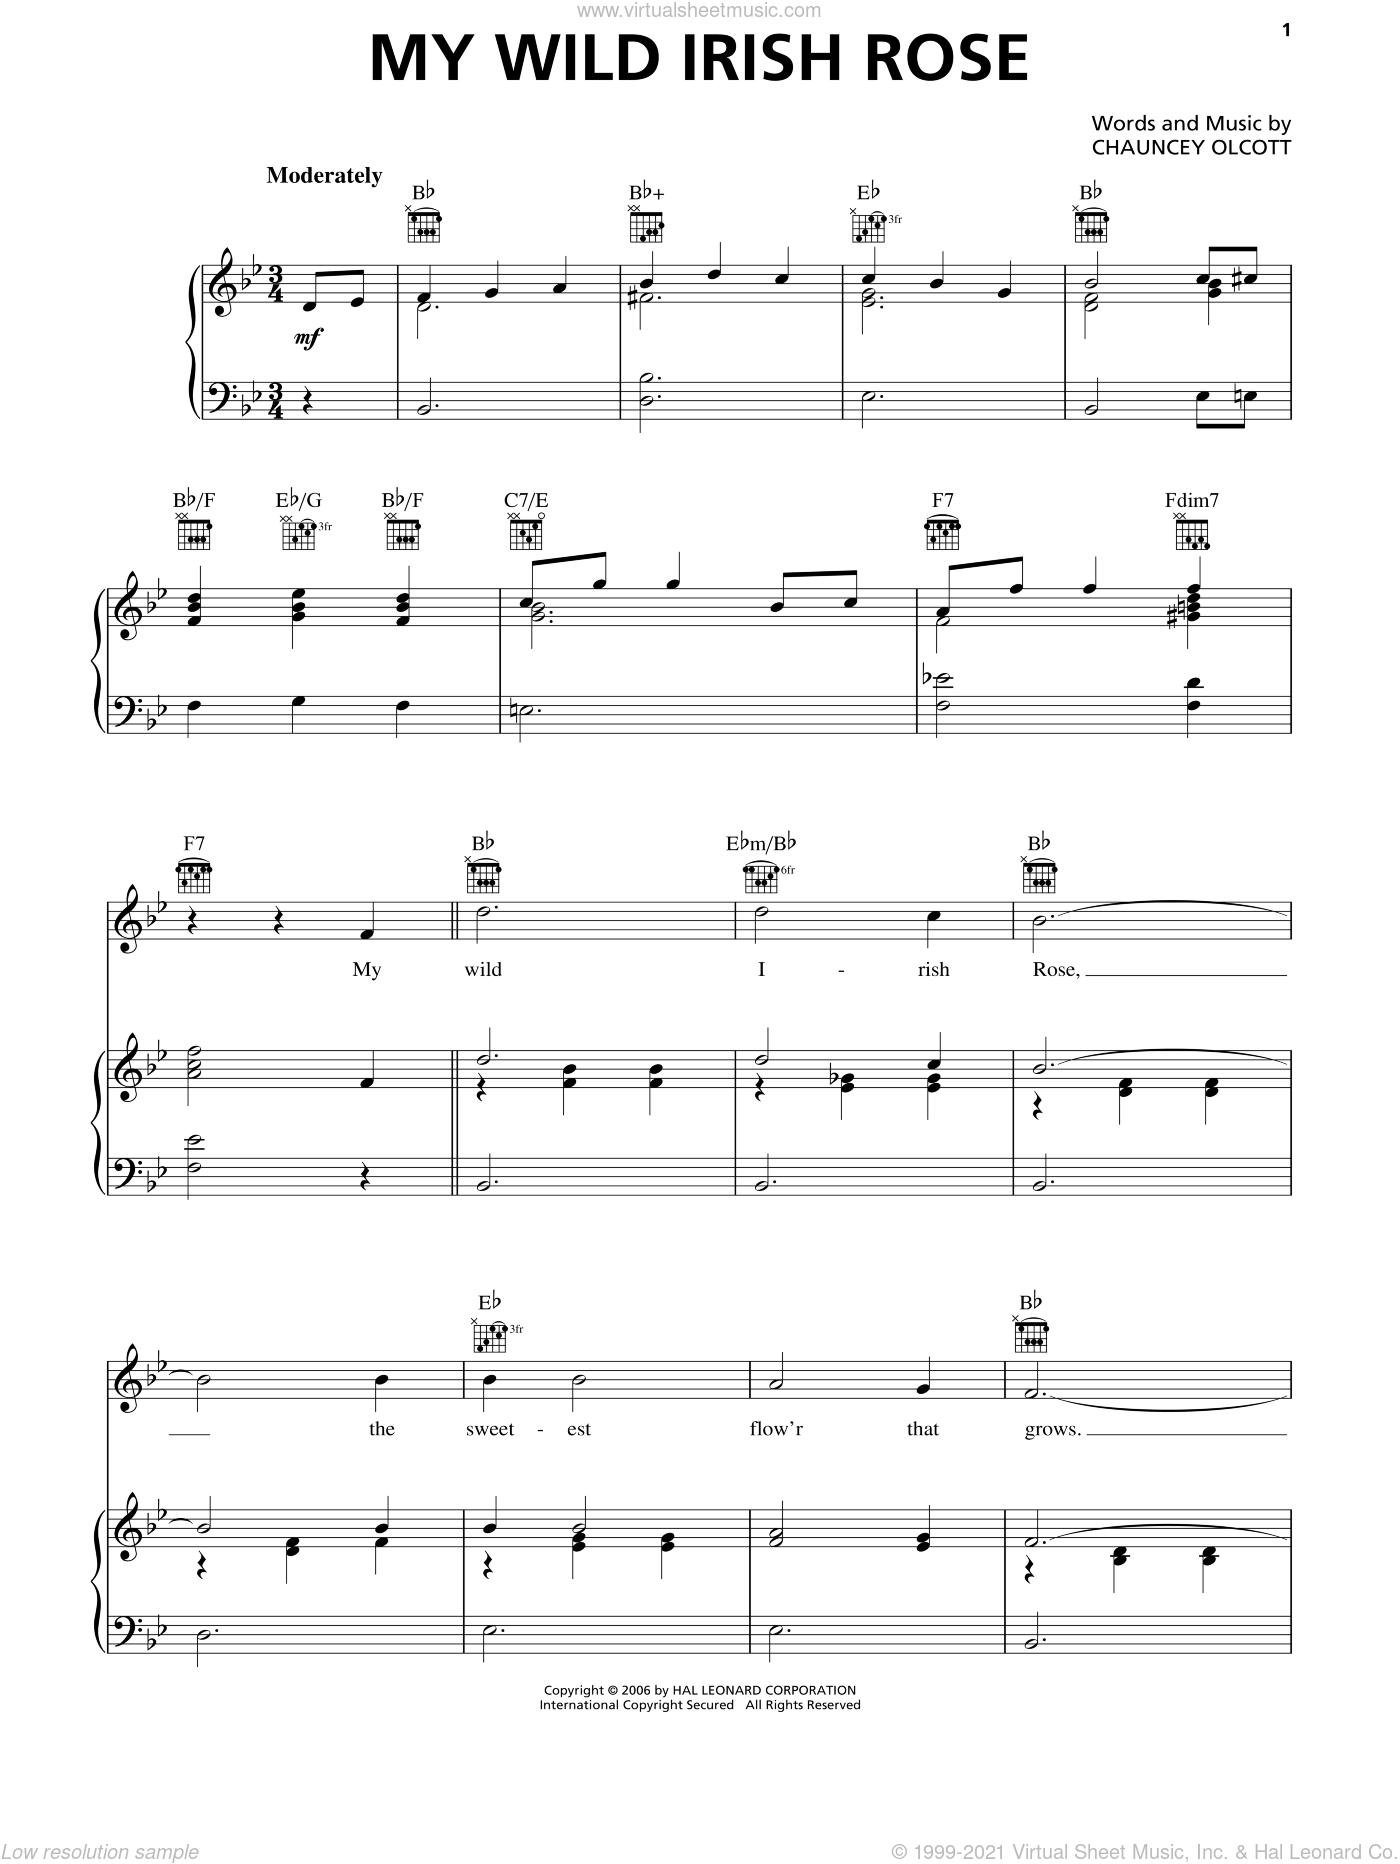 My Wild Irish Rose sheet music for voice, piano or guitar by Chauncey Olcott, intermediate skill level